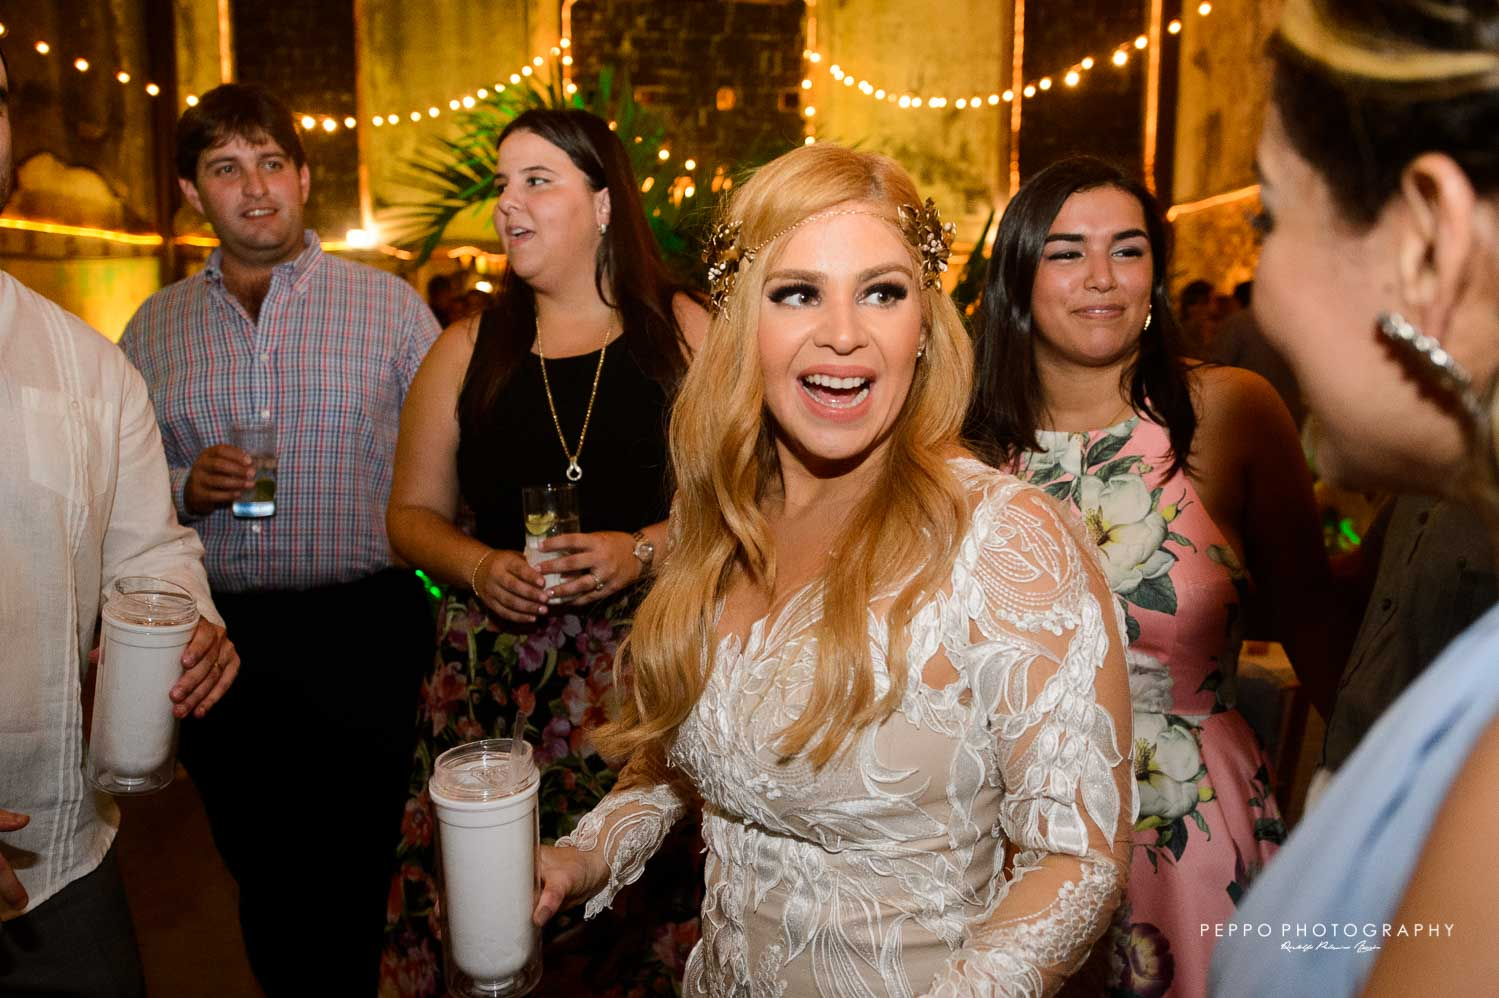 Johanna dancing bride